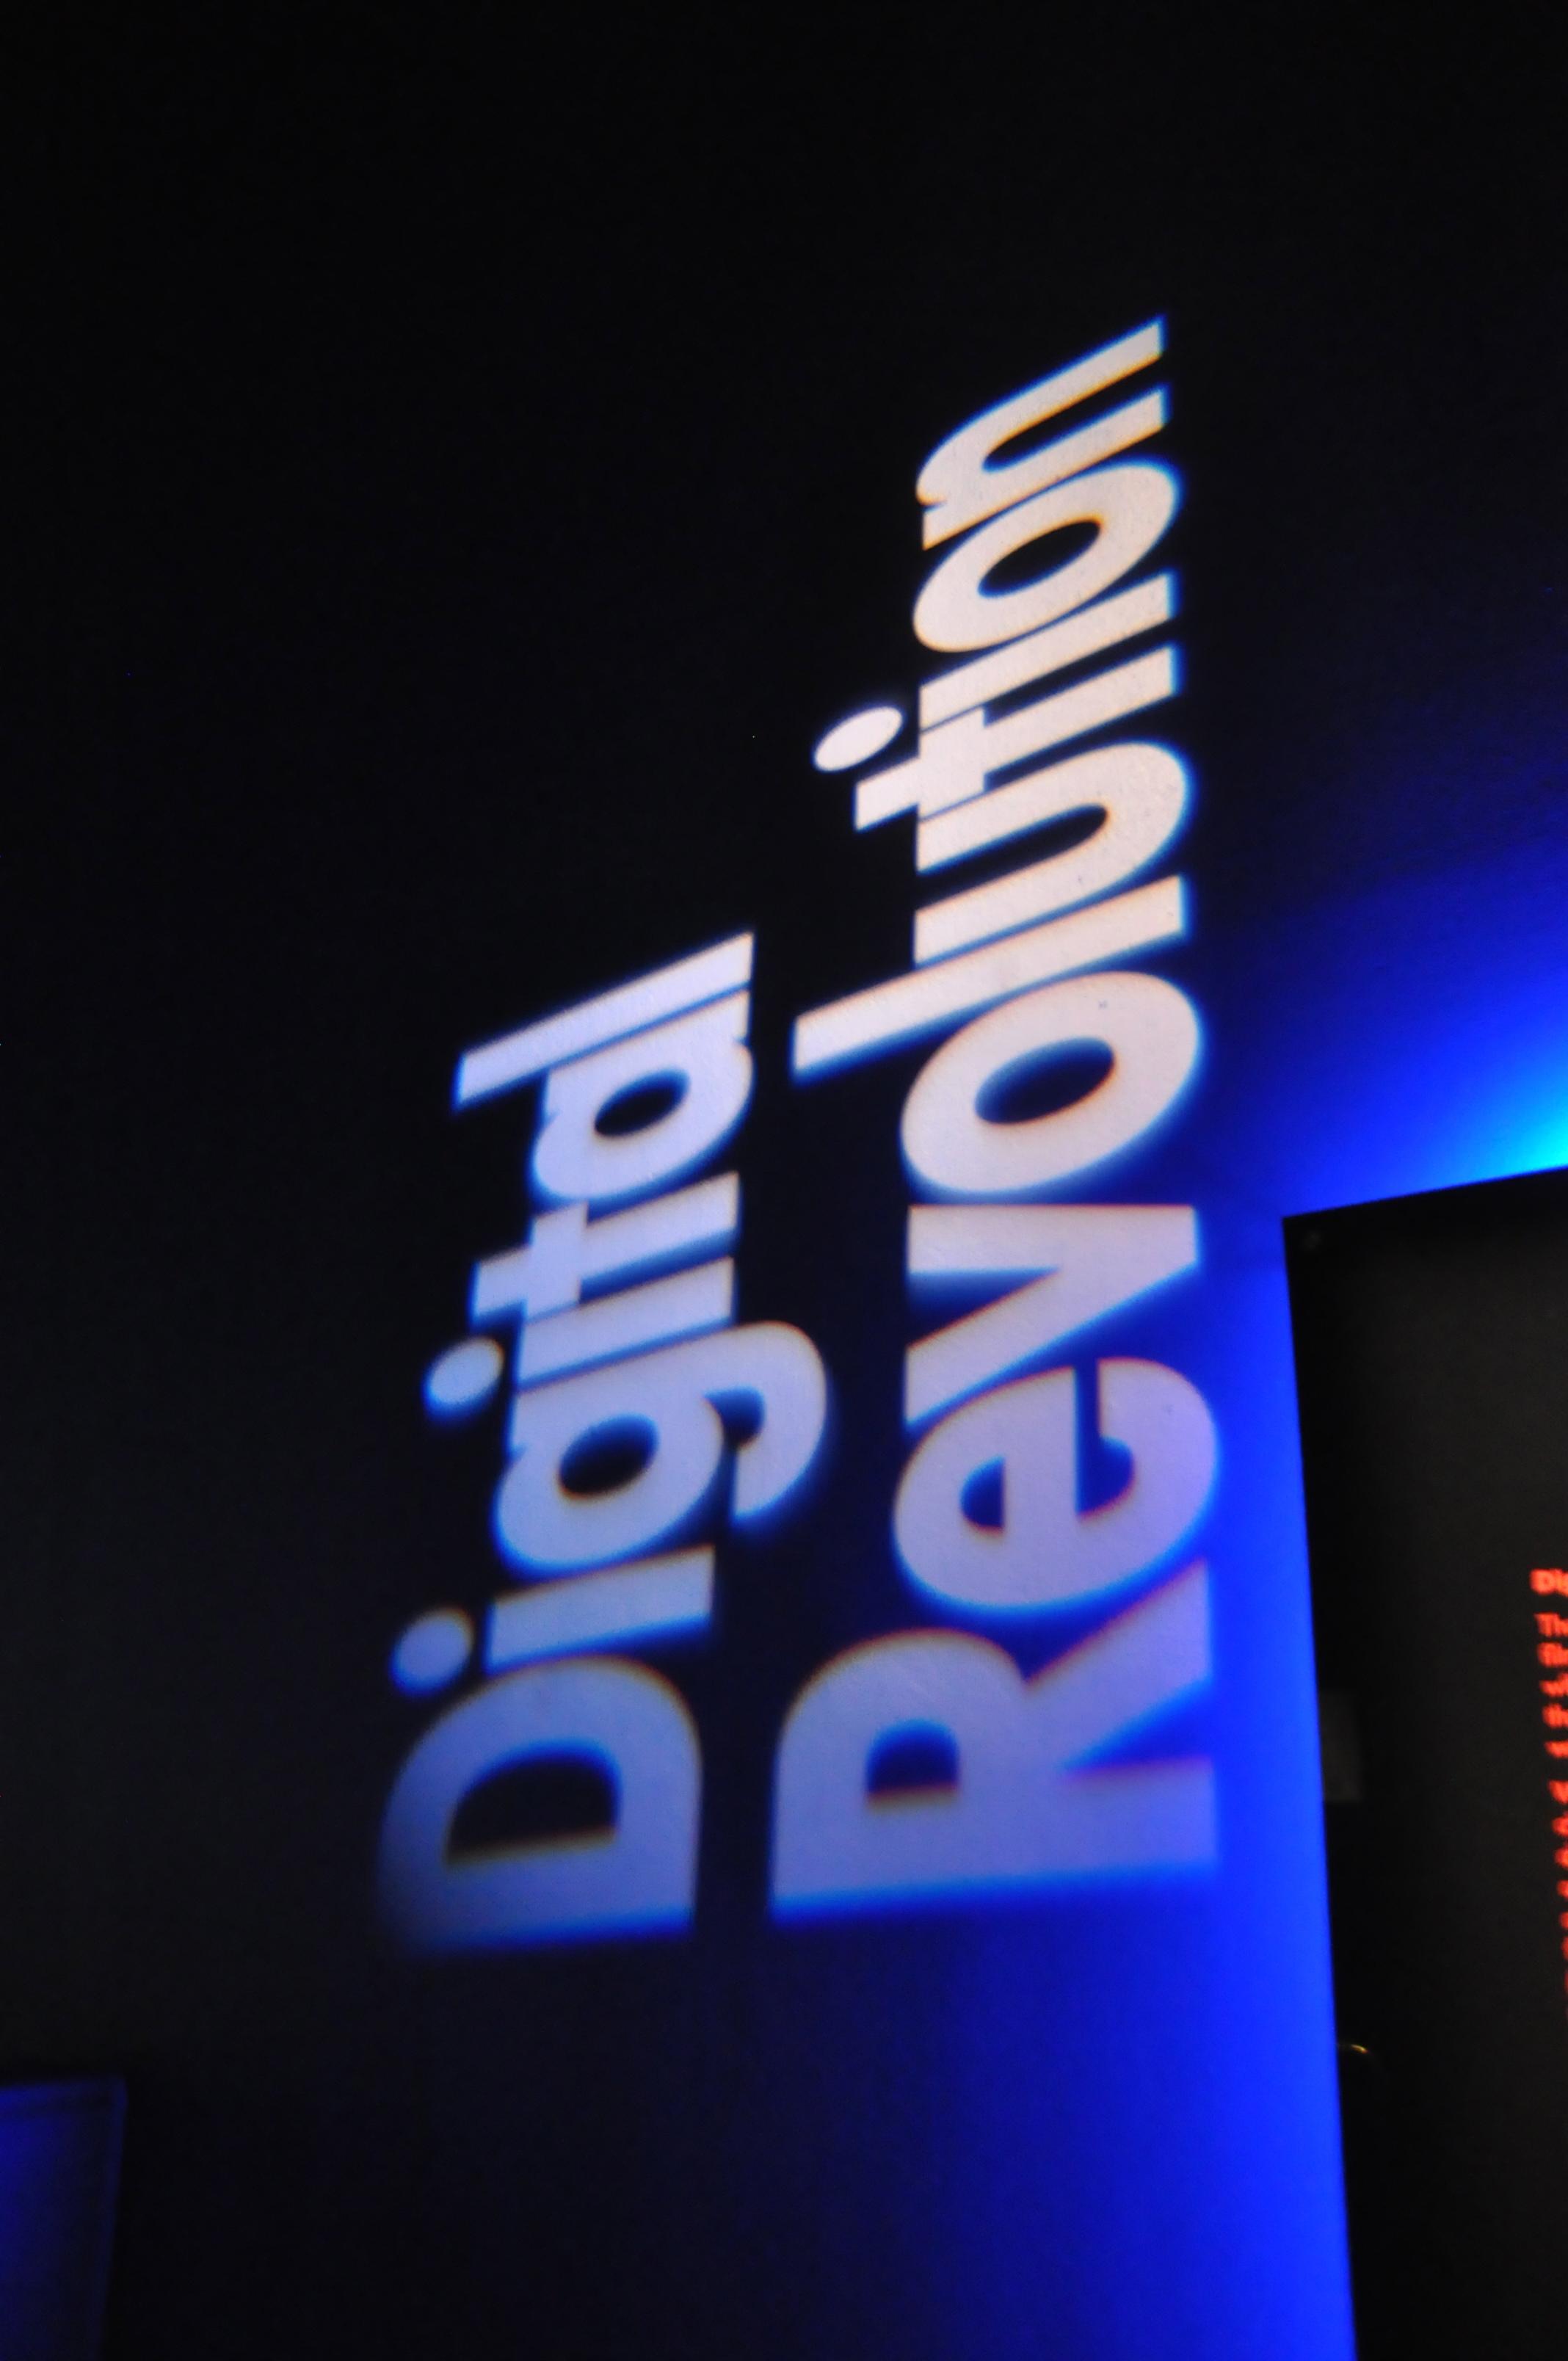 Review: Digital Revolution at the Barbican